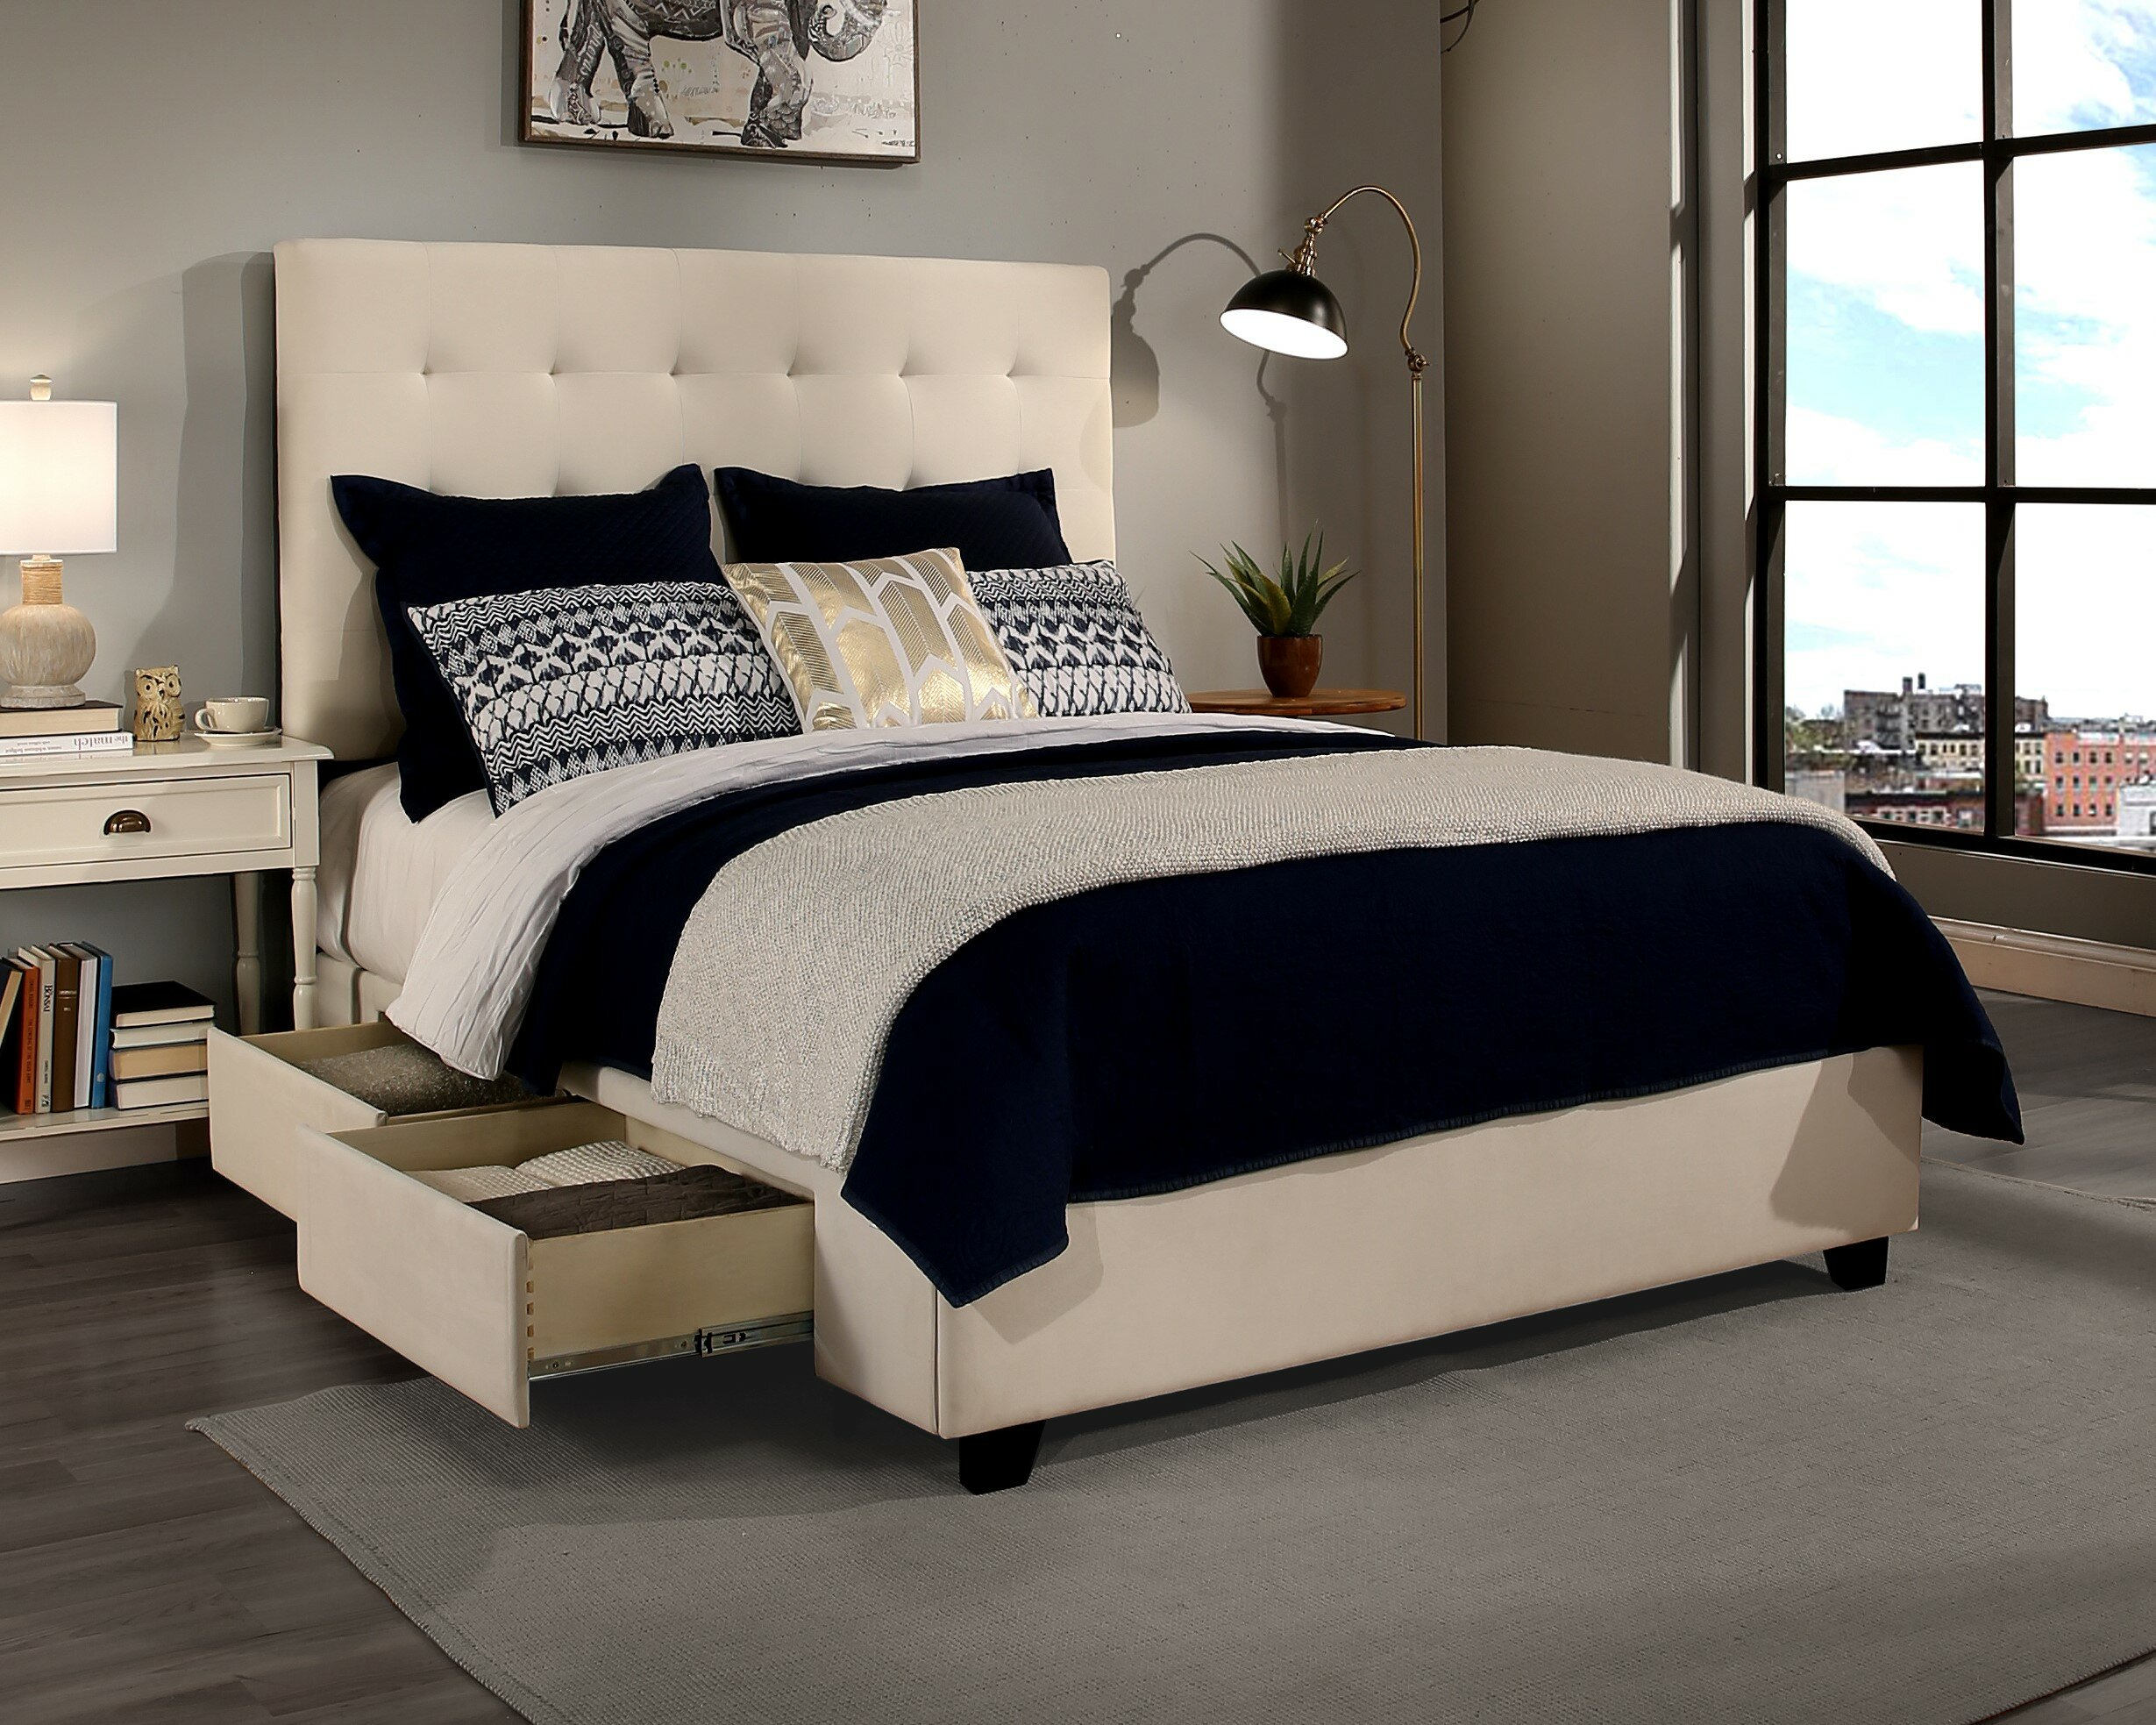 Fantastic Almendarez 2 Drawer Upholstered Storage Platform Bed With Bench Set Queen Size Ivory Colour Pdpeps Interior Chair Design Pdpepsorg